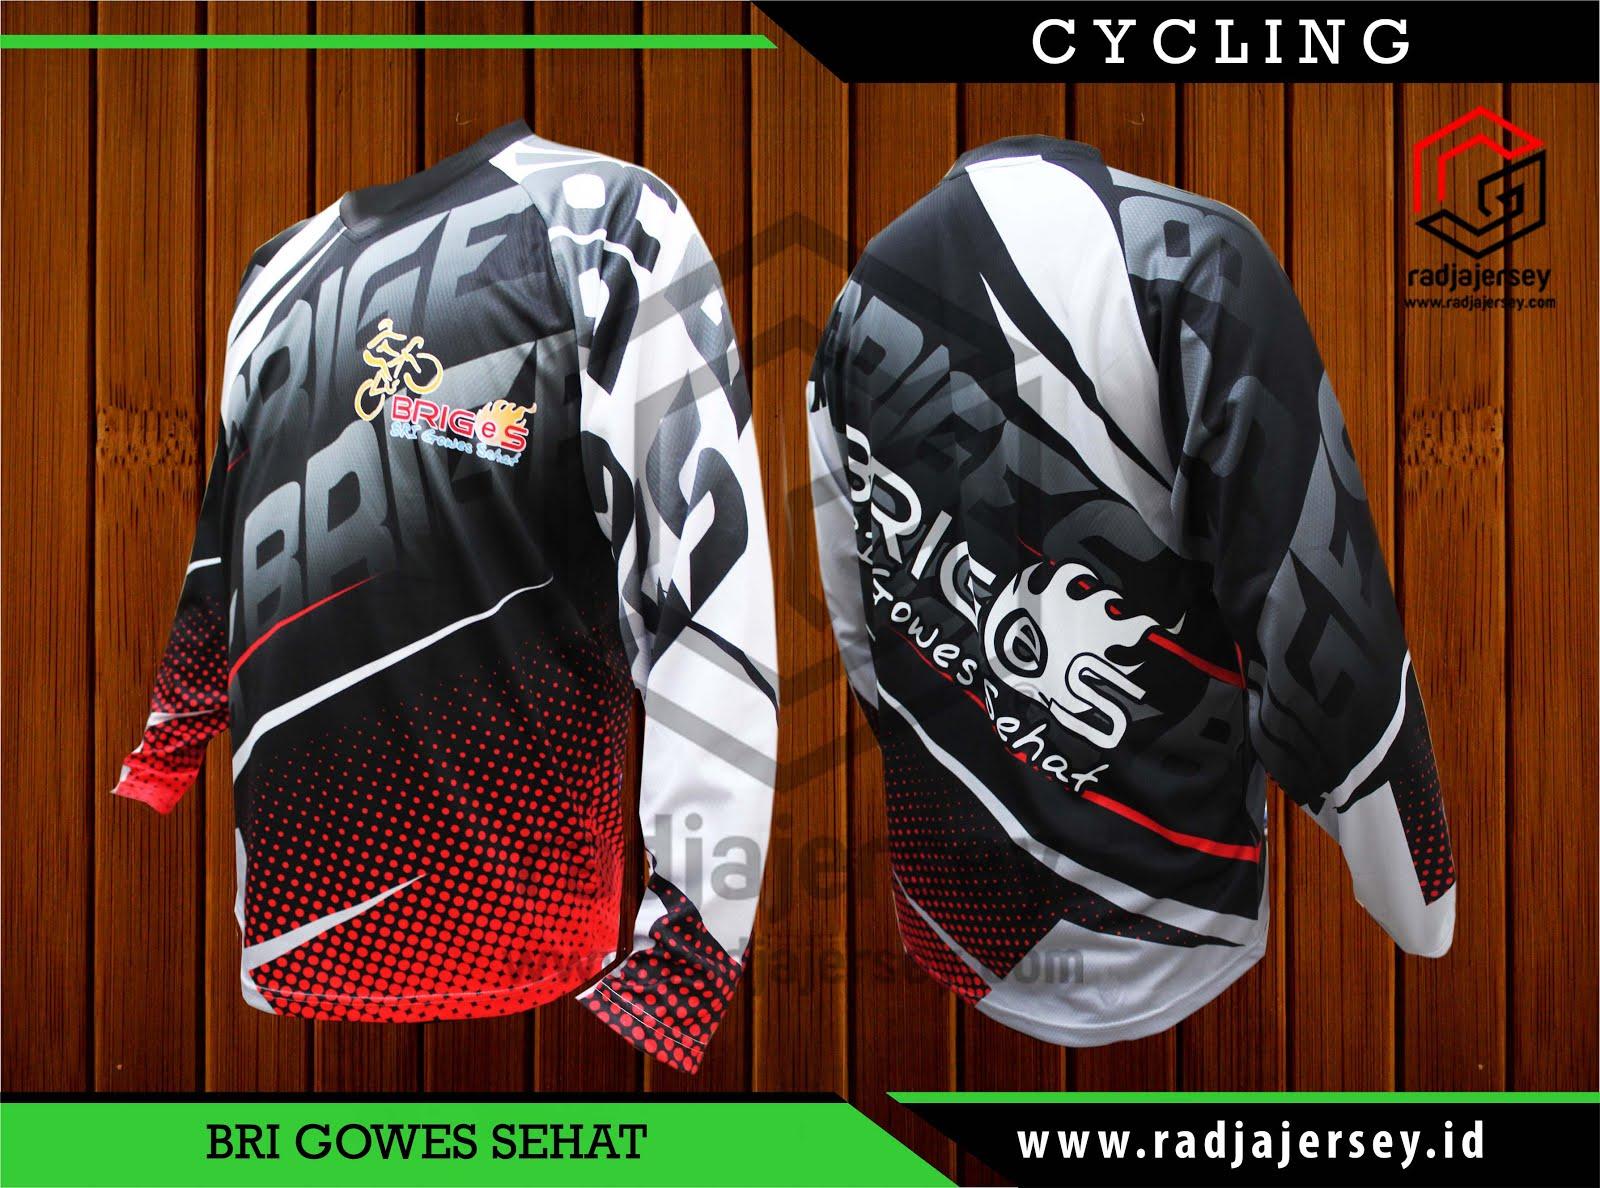 Jersey Sepeda Anak Baju Tld Dry Fit Stelan Cross 1 Harga Dewasa Wanita Size Chart Desain